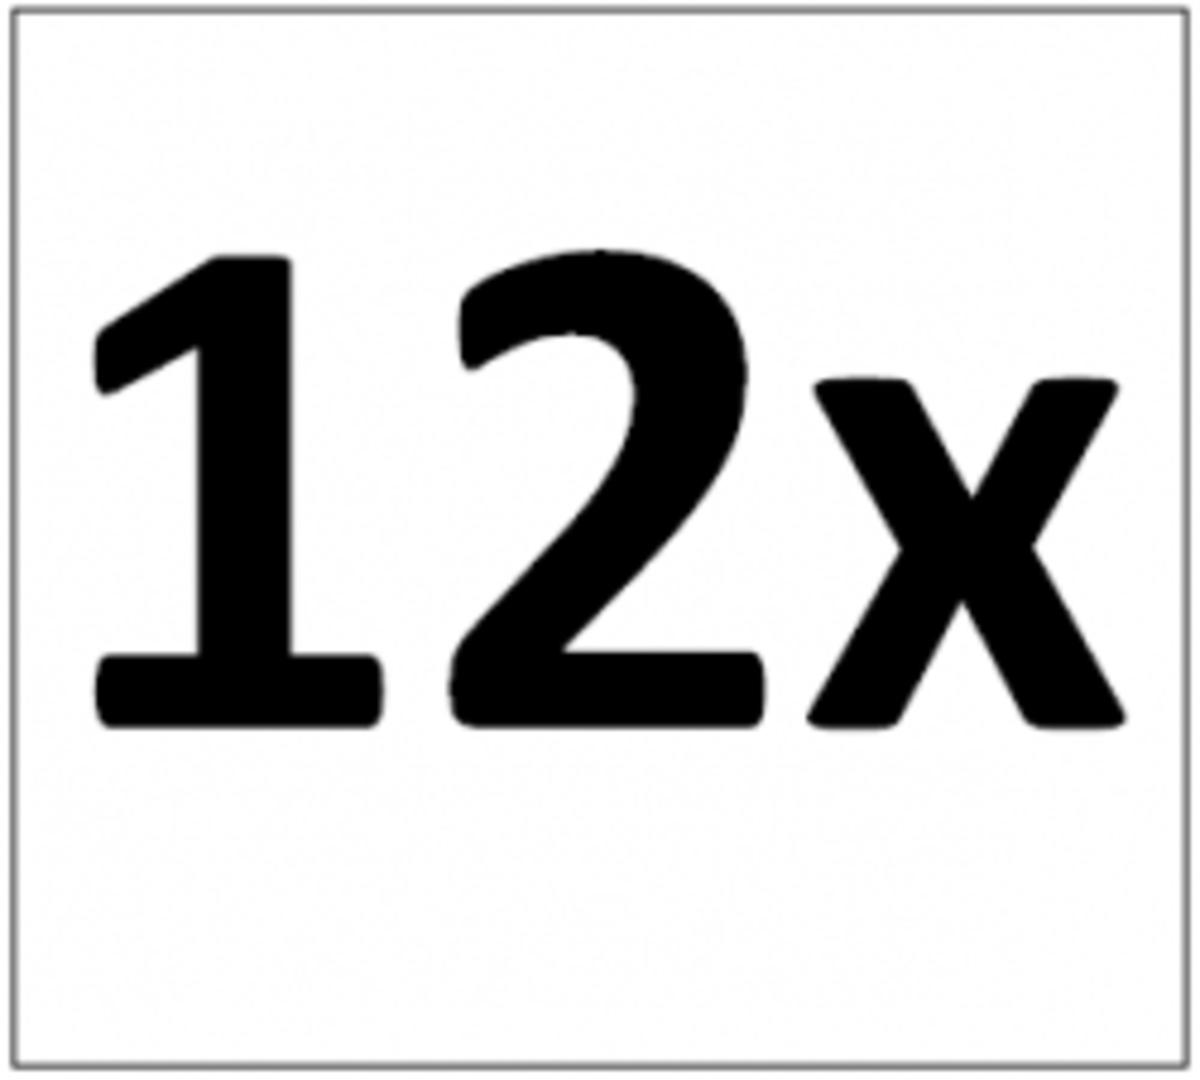 Twelve Times Table